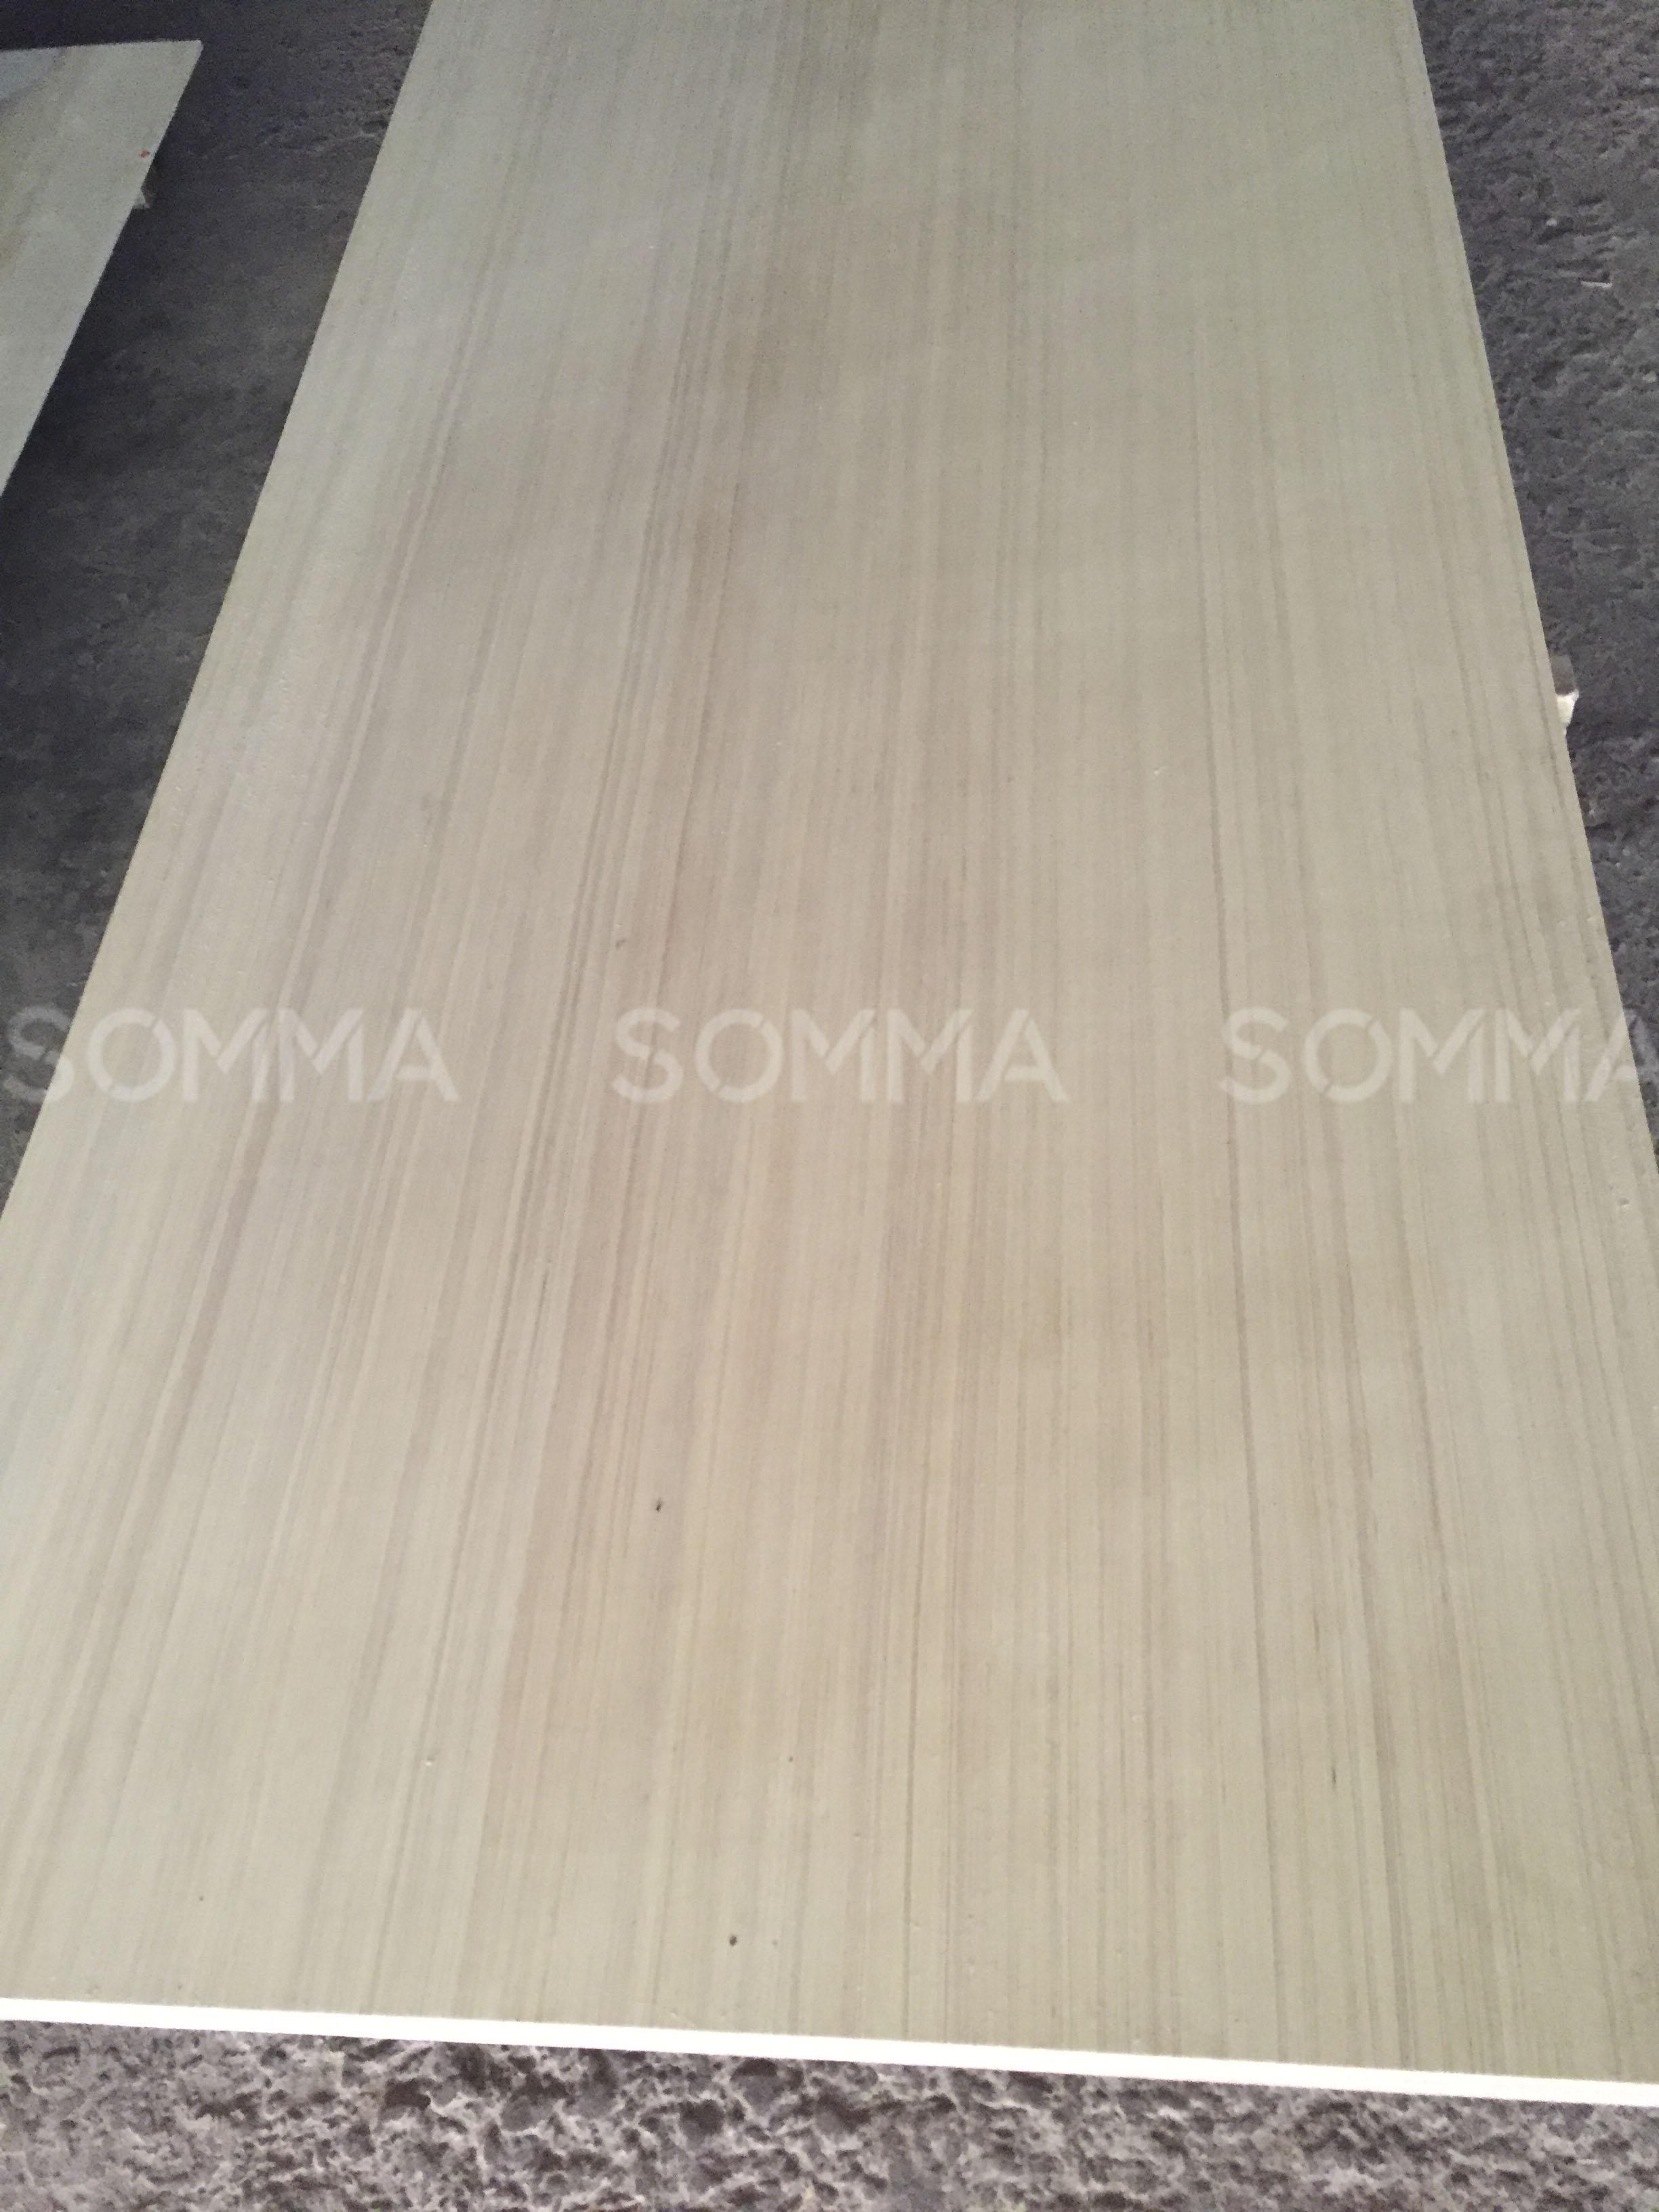 Plywood core for preparing melamine coating